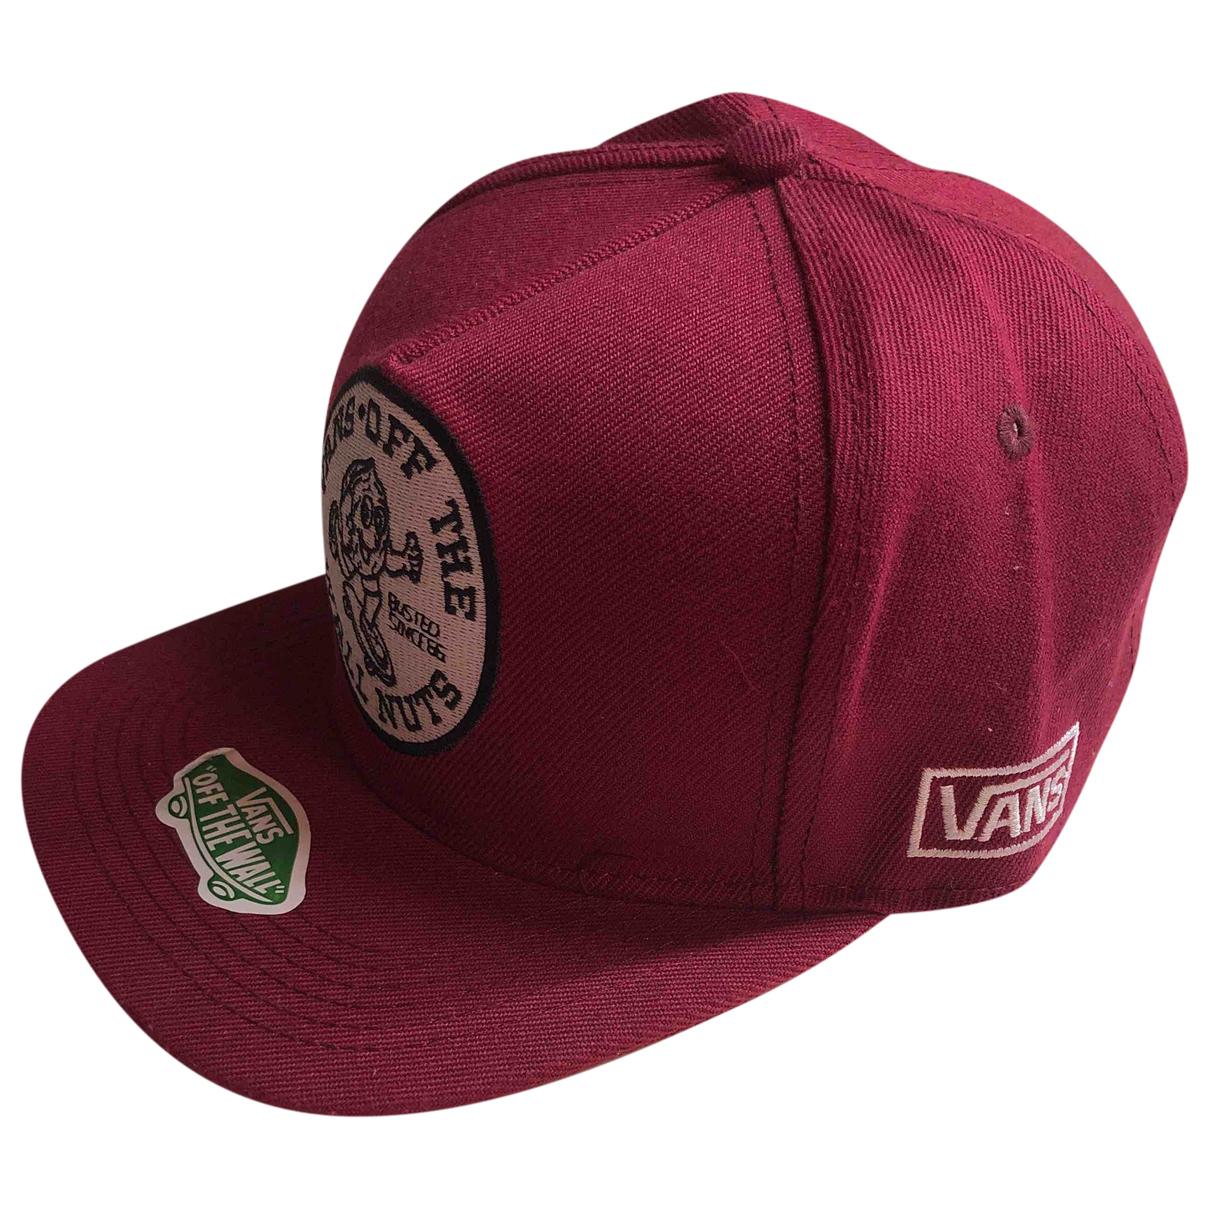 Sombrero / gorro de Lona Vans